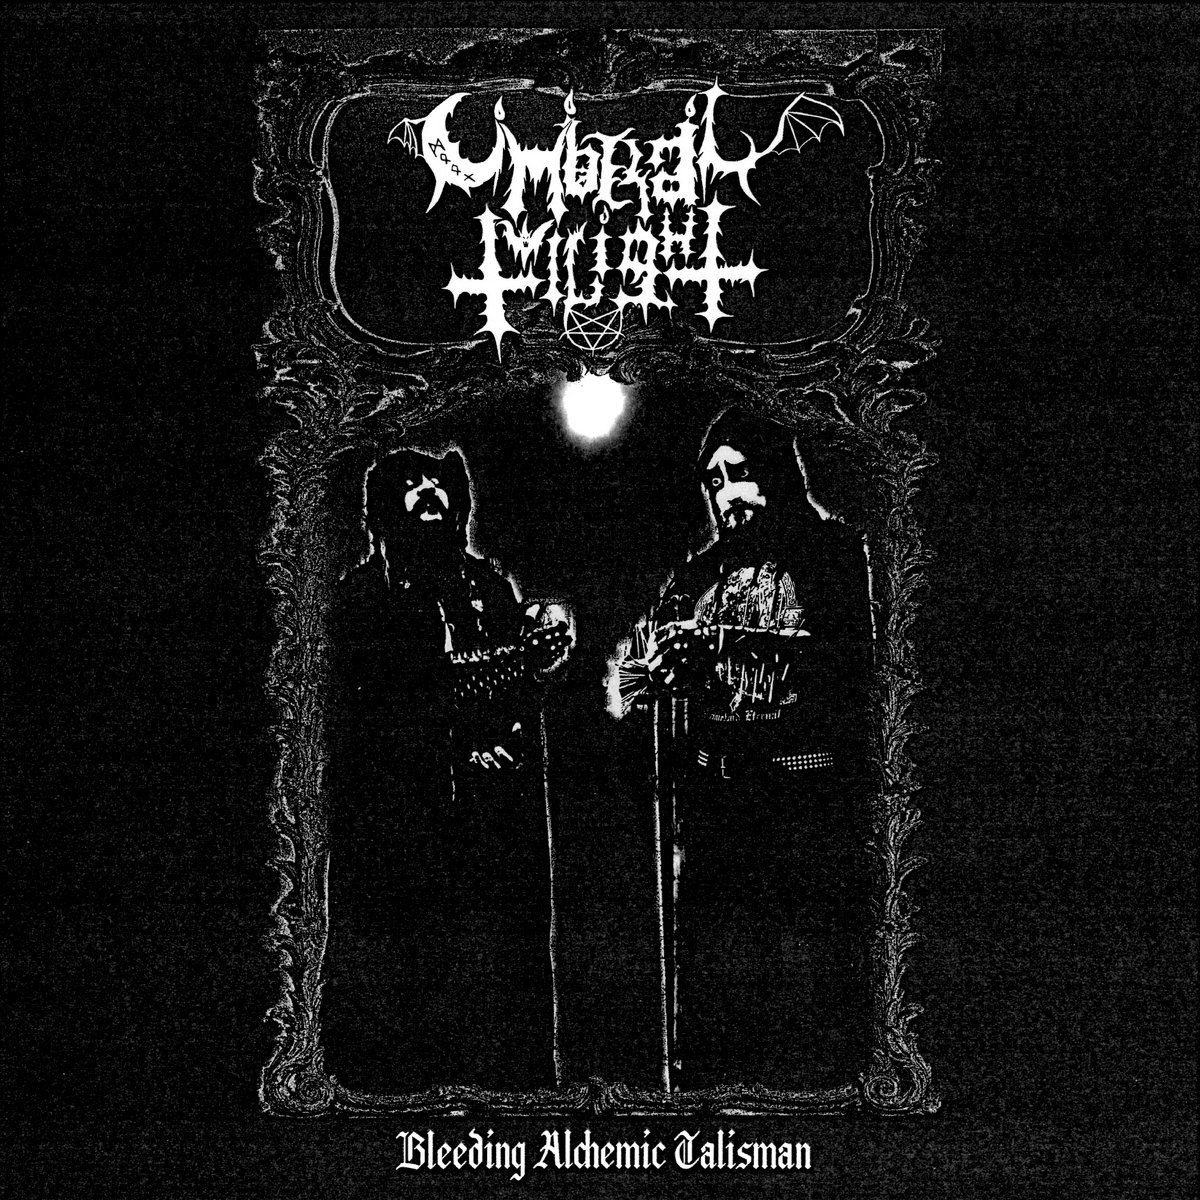 Reviews for Umbral Twilight - Bleeding Alchemic Talisman